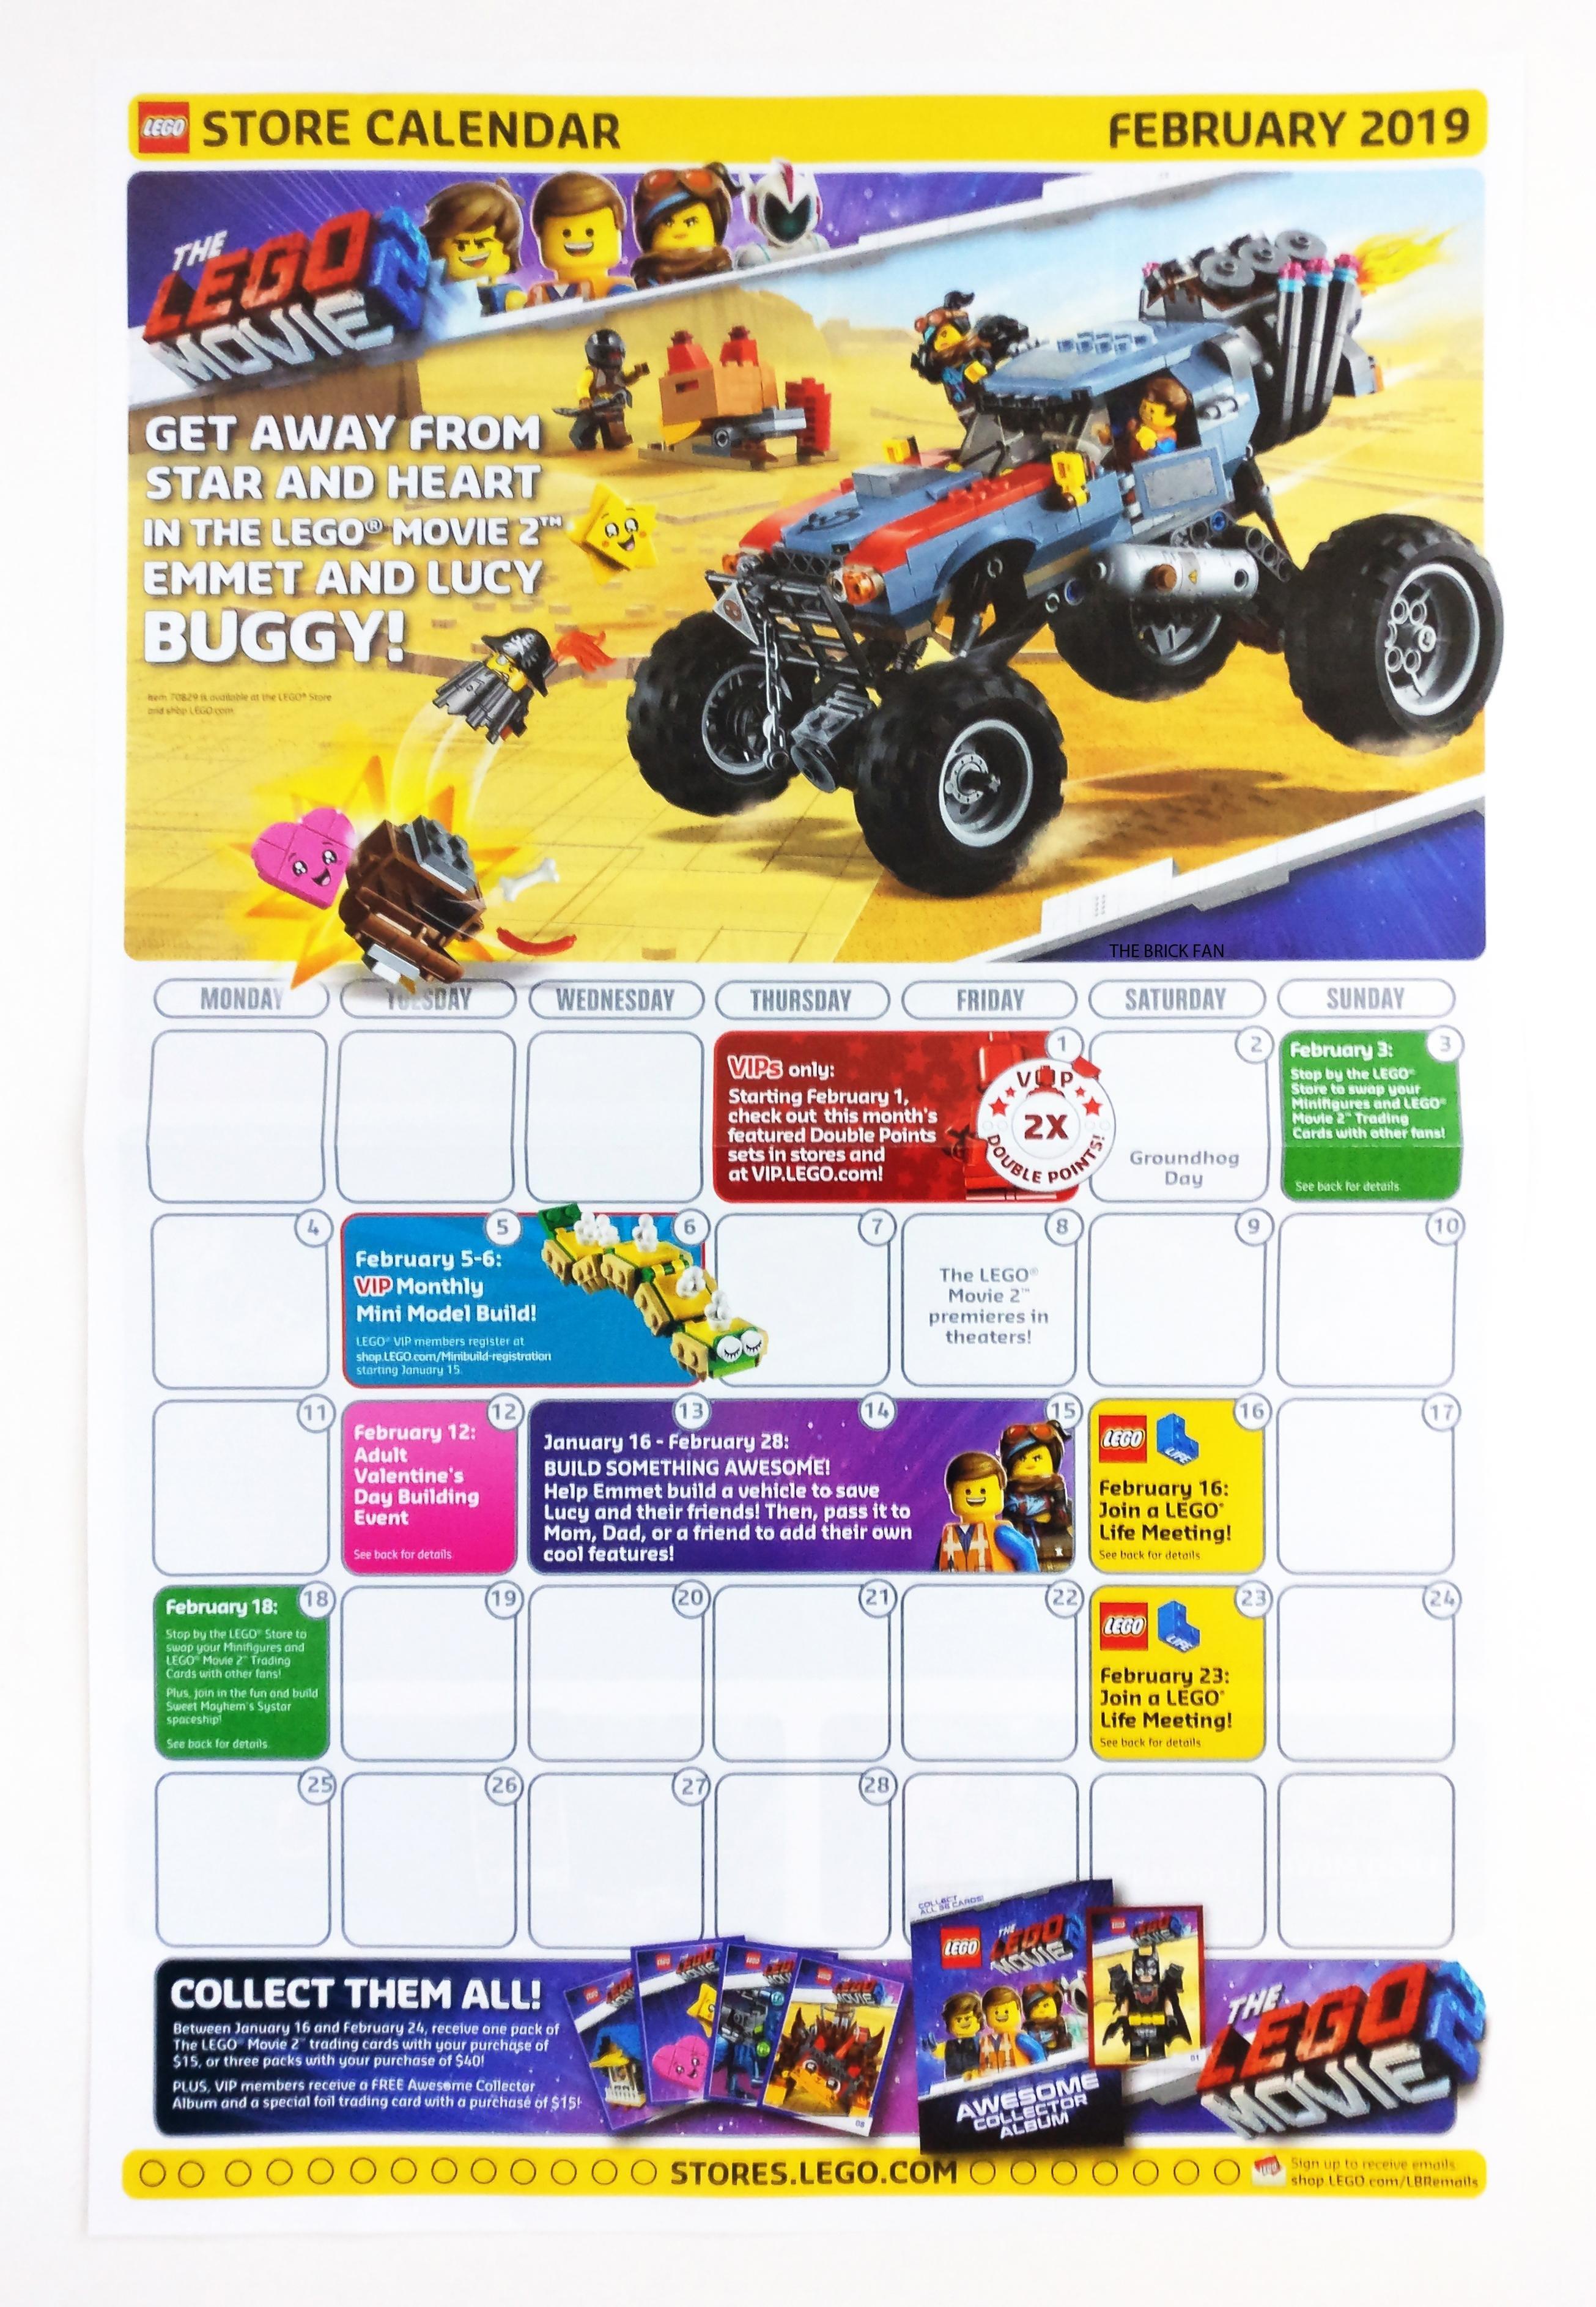 February 2019 Lego Store Calendar : Lego Calendar 2019 In Stores